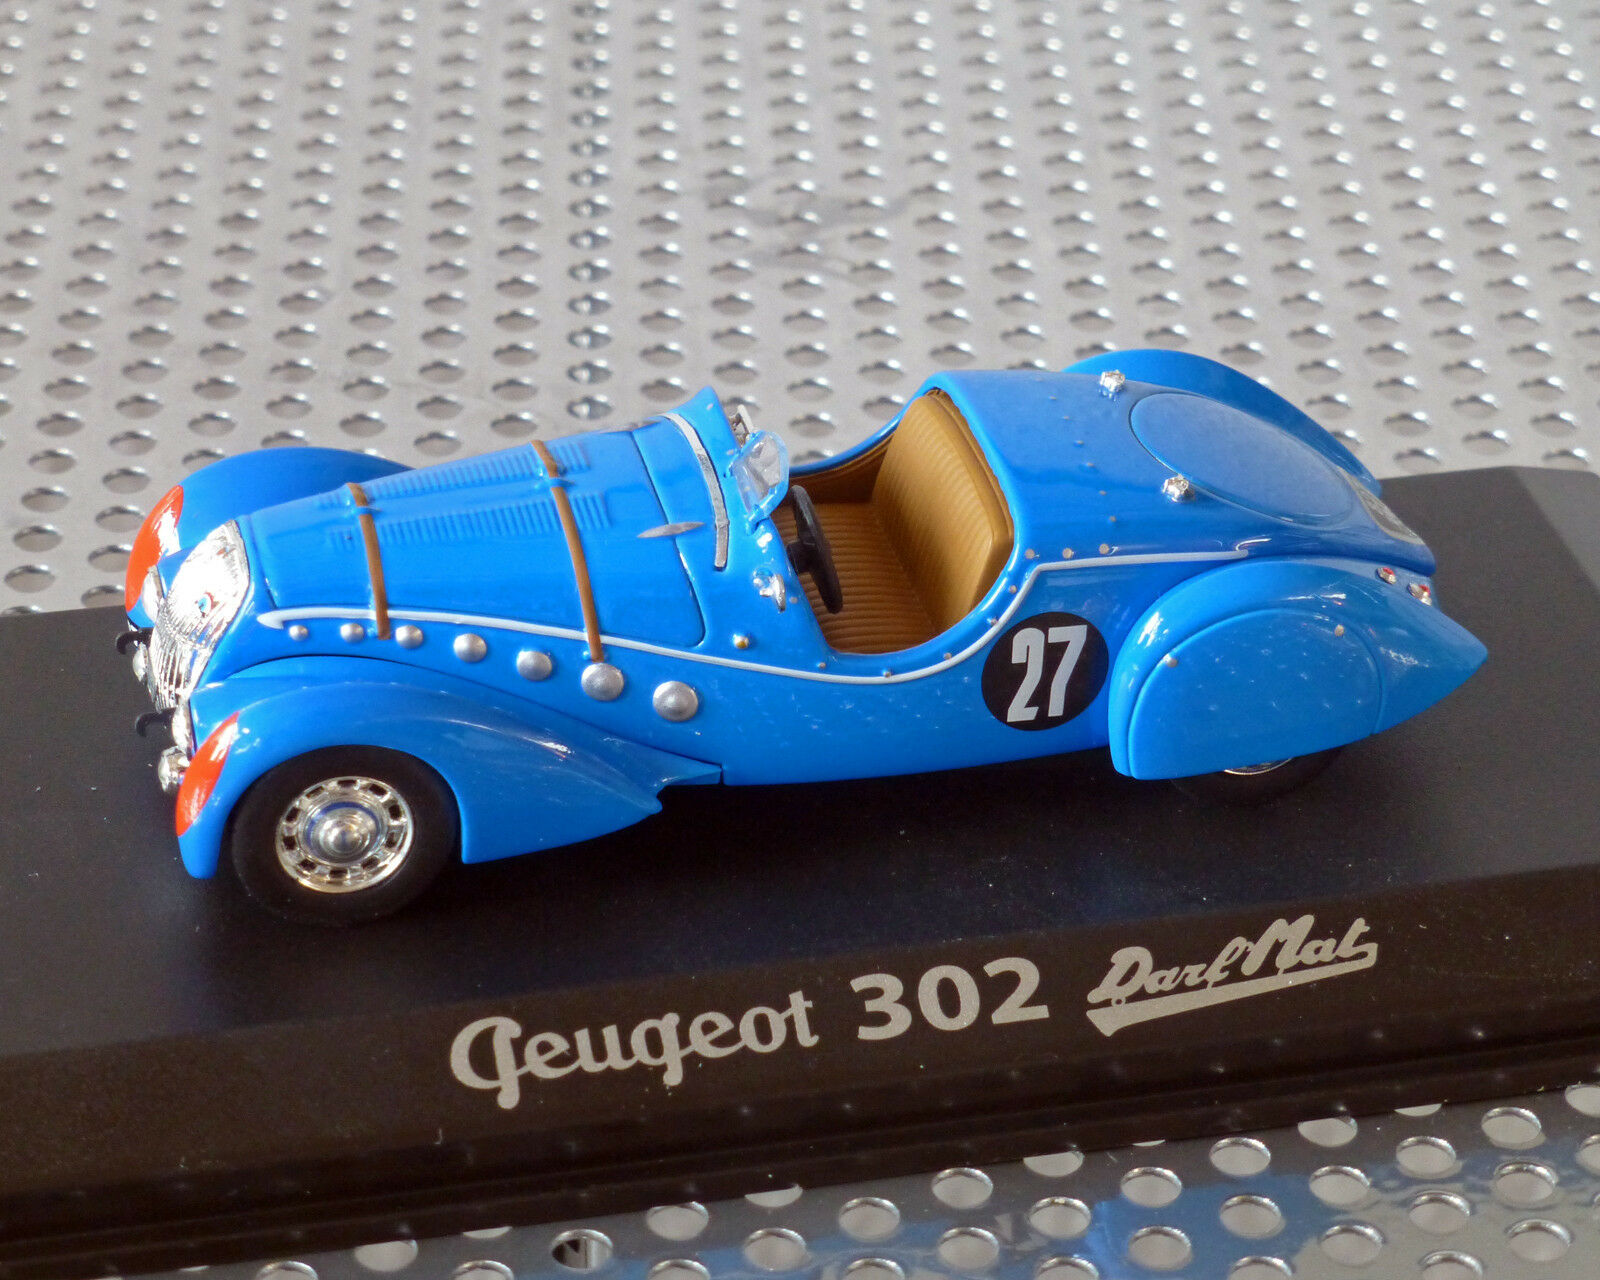 PEUGEOT 302 DARL ' Mat bluee, 1 43, Norev